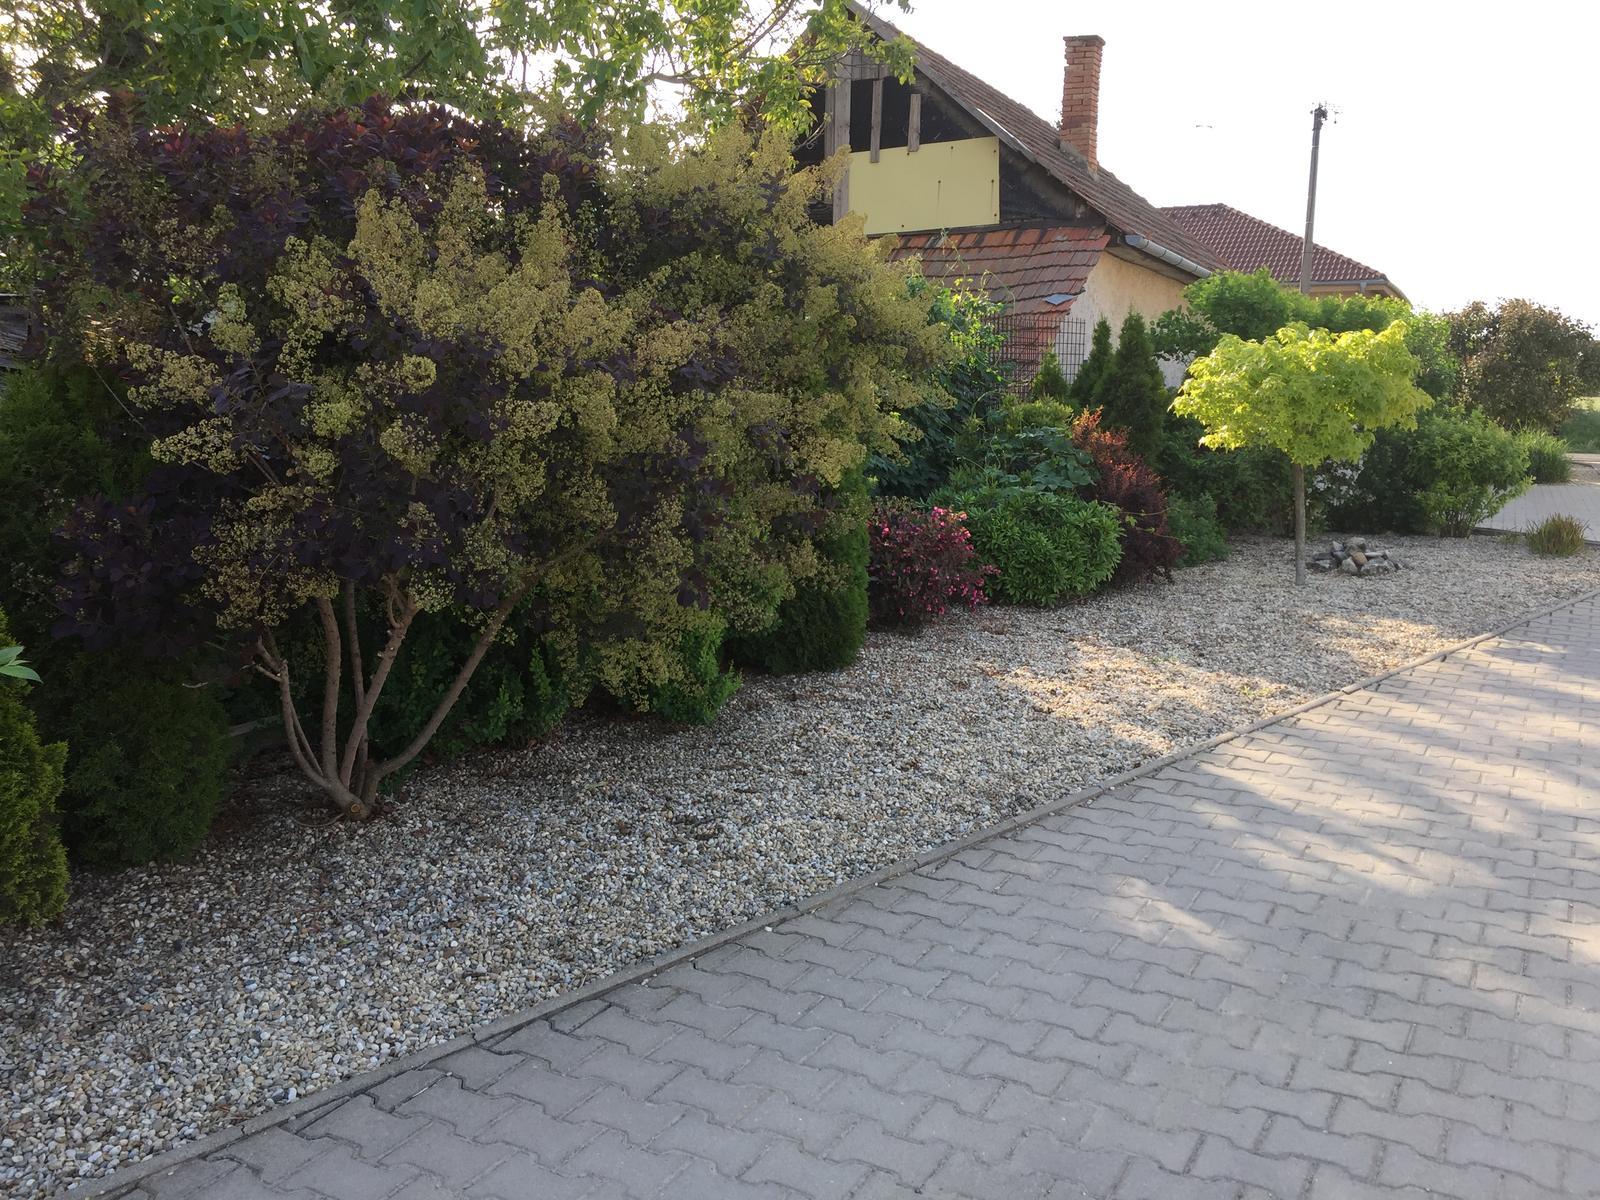 Okolie domu - Obrázok č. 117